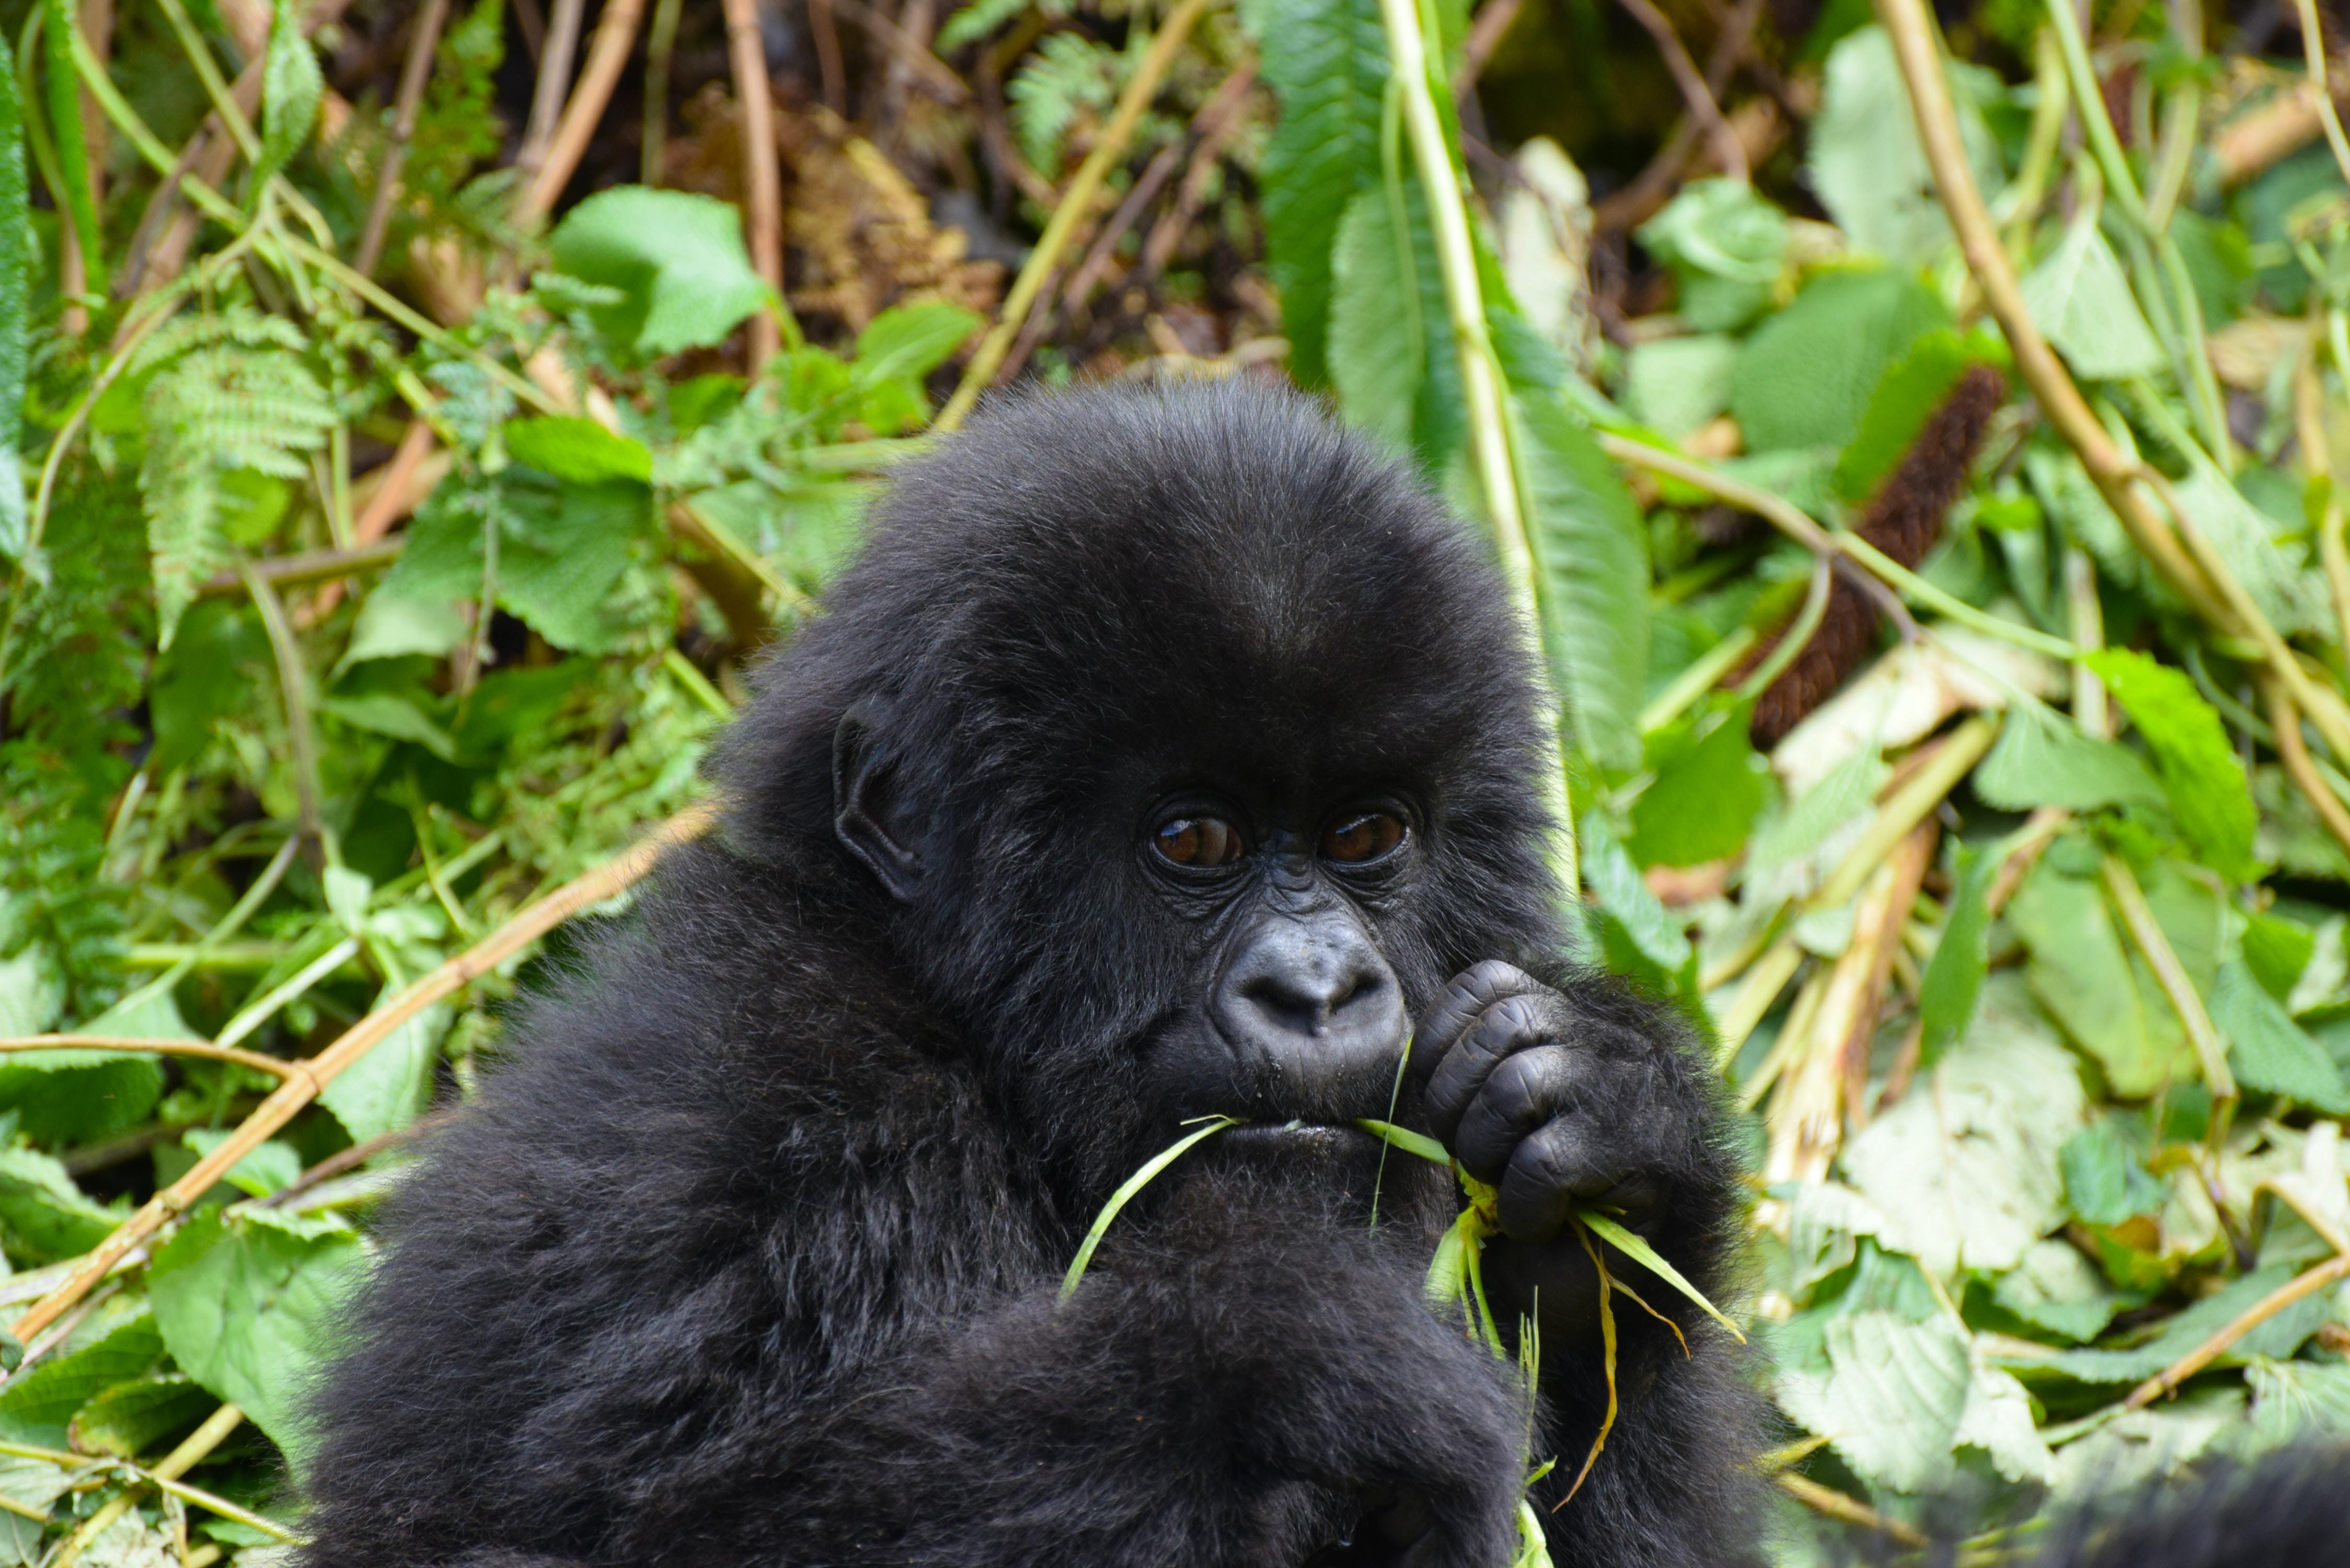 black baby monkey eating grass